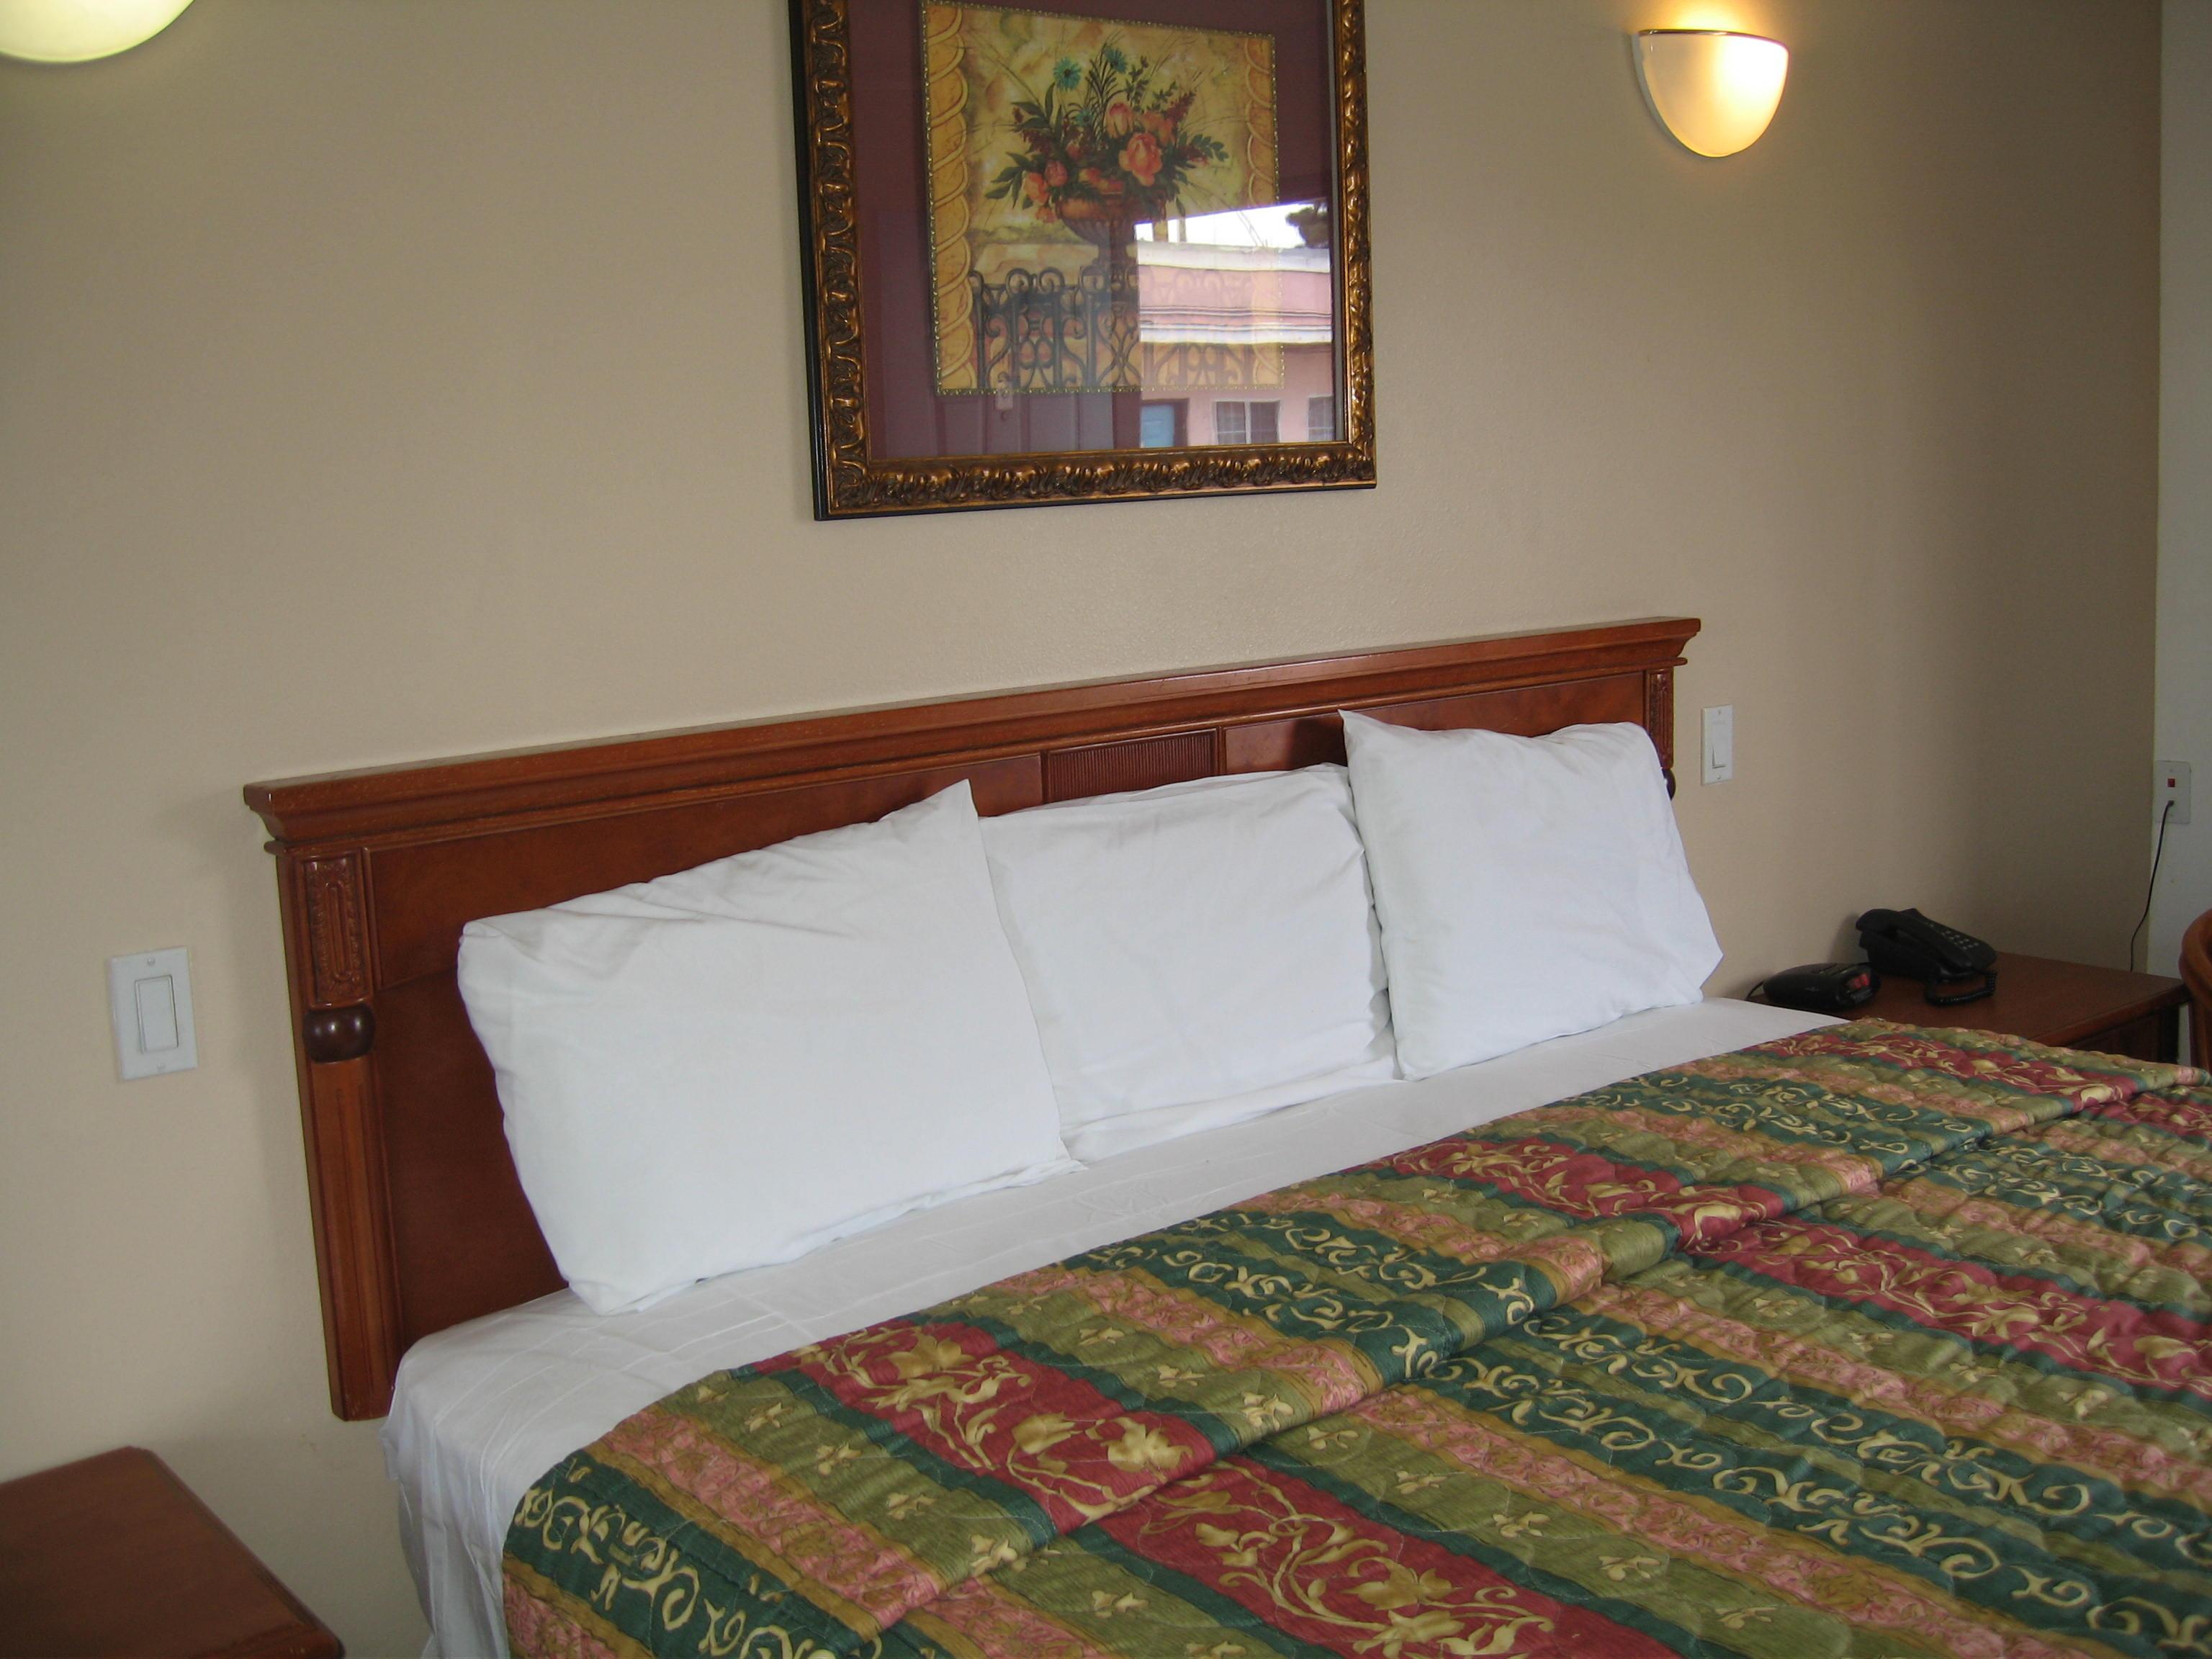 New Motel Pic 005_20140925-11154132.jpg